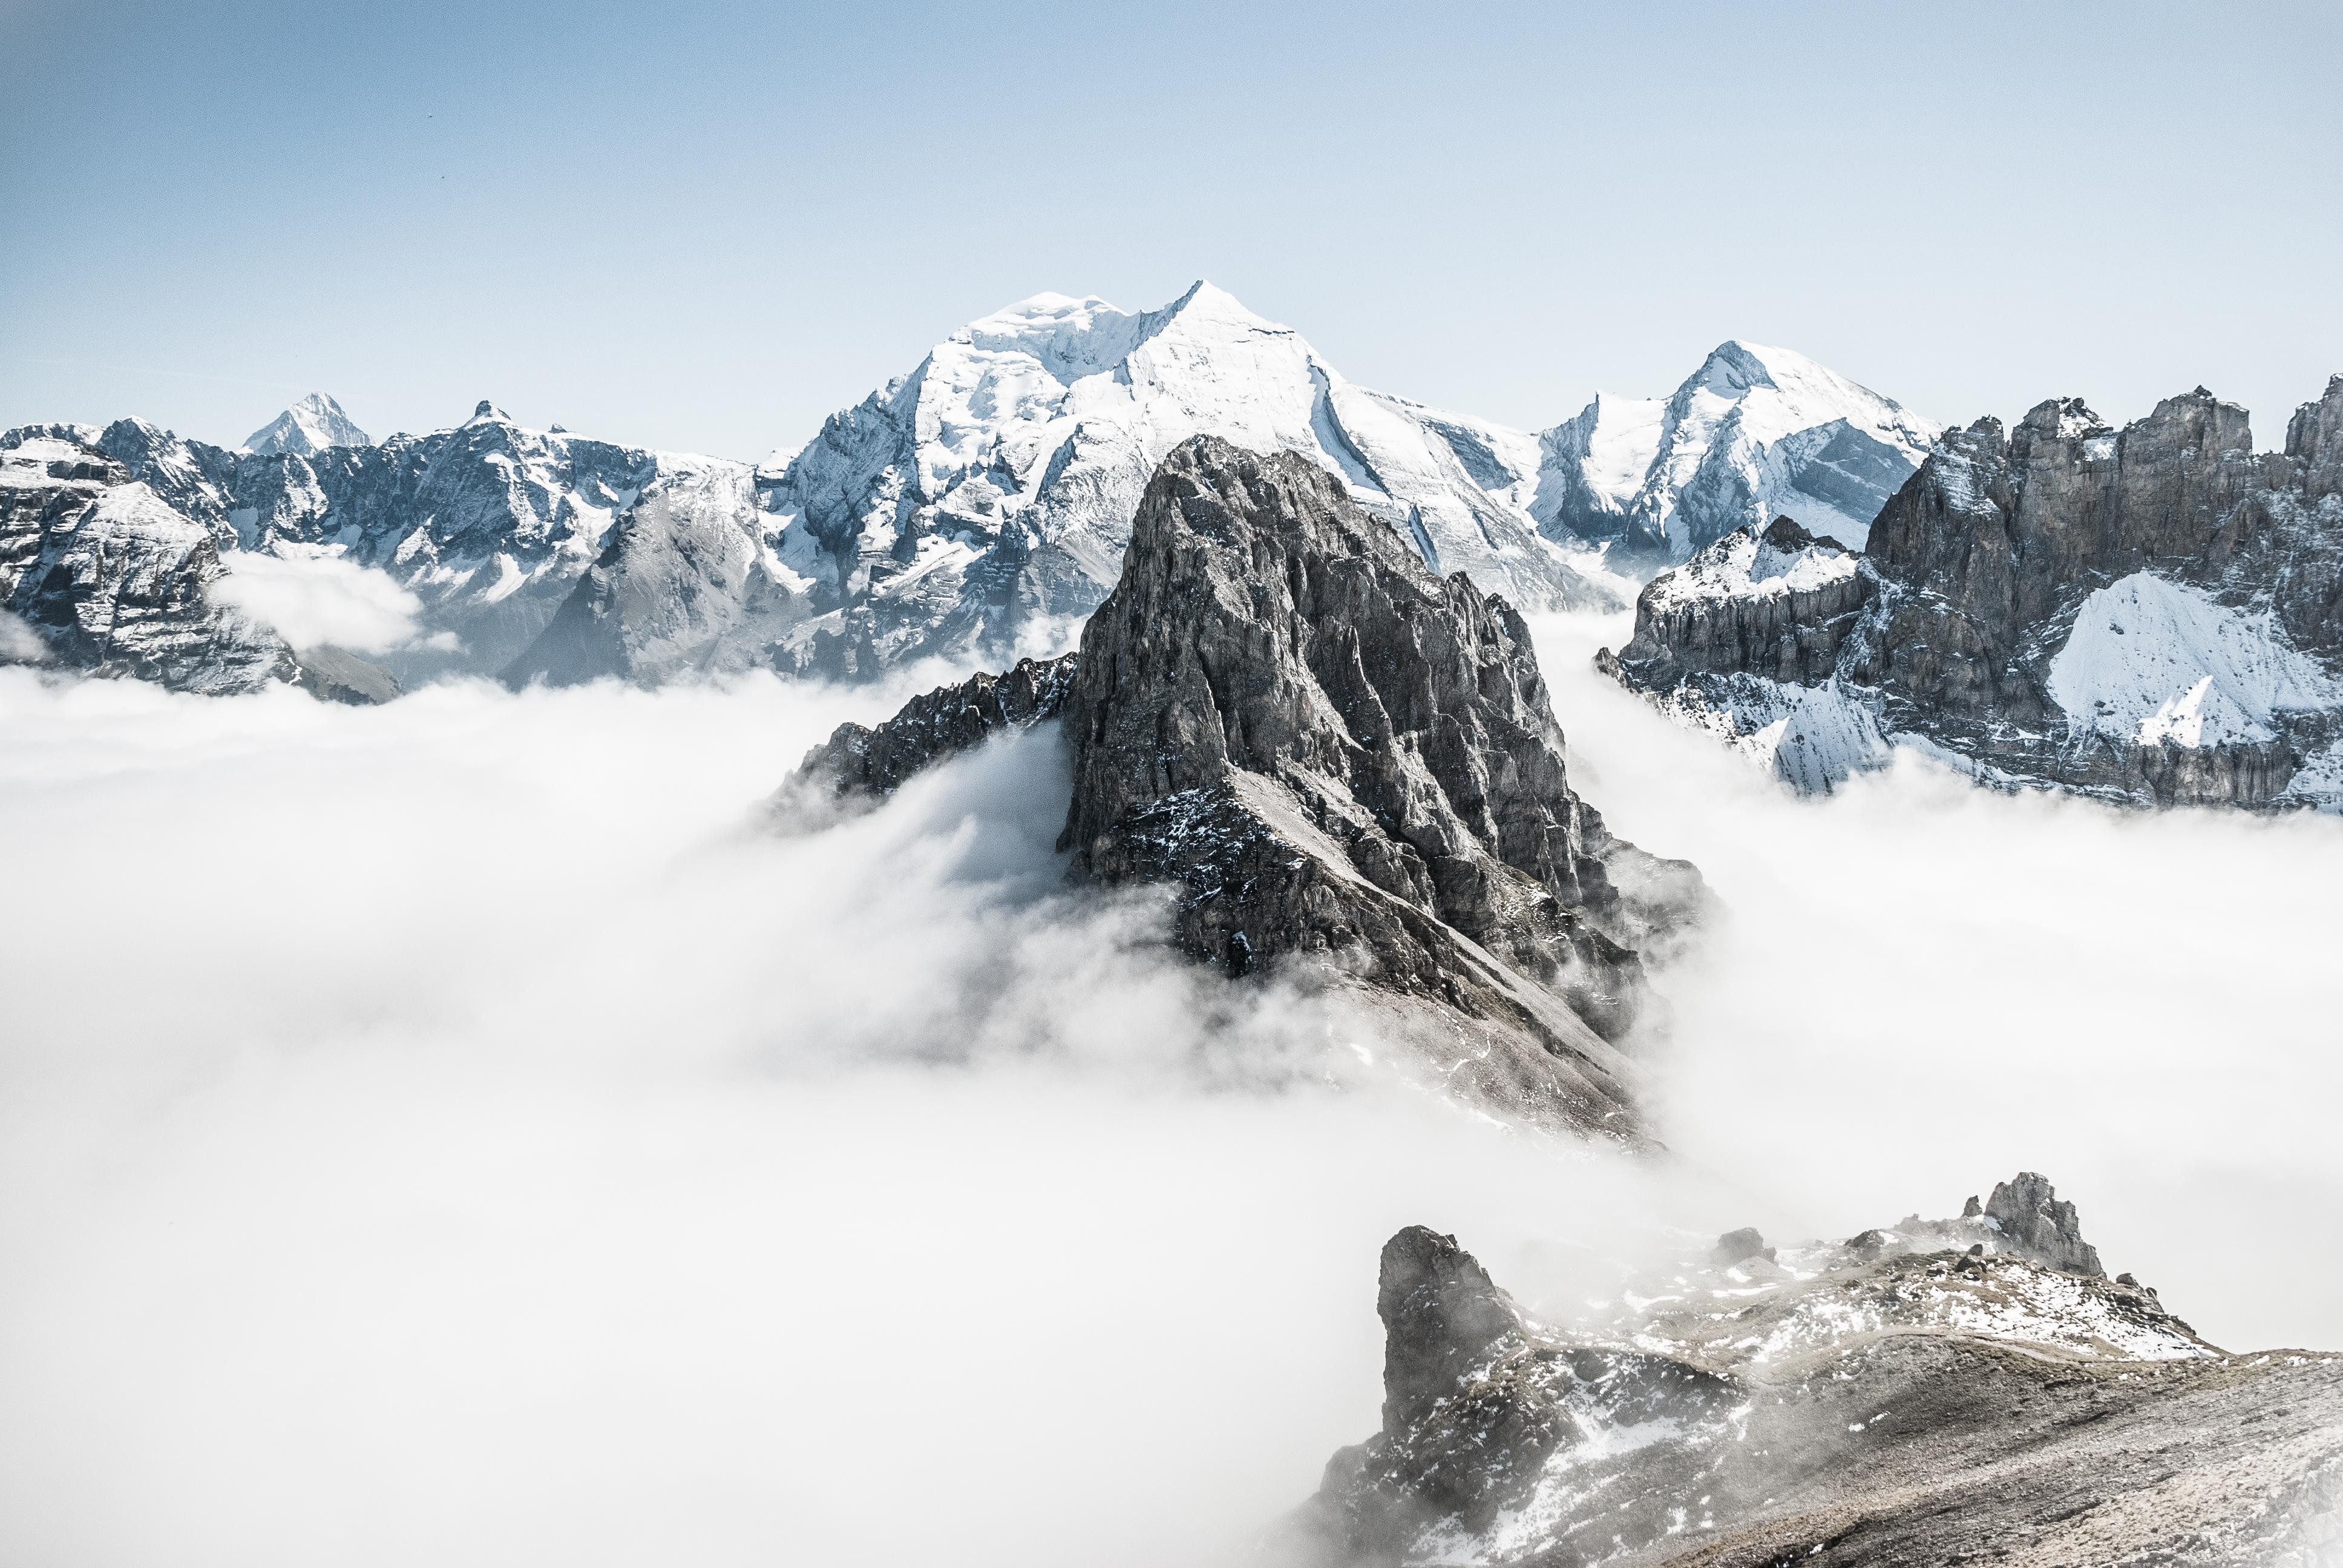 free images   nature  winter  mountain range  weather  sea of clouds  season  ridge  summit